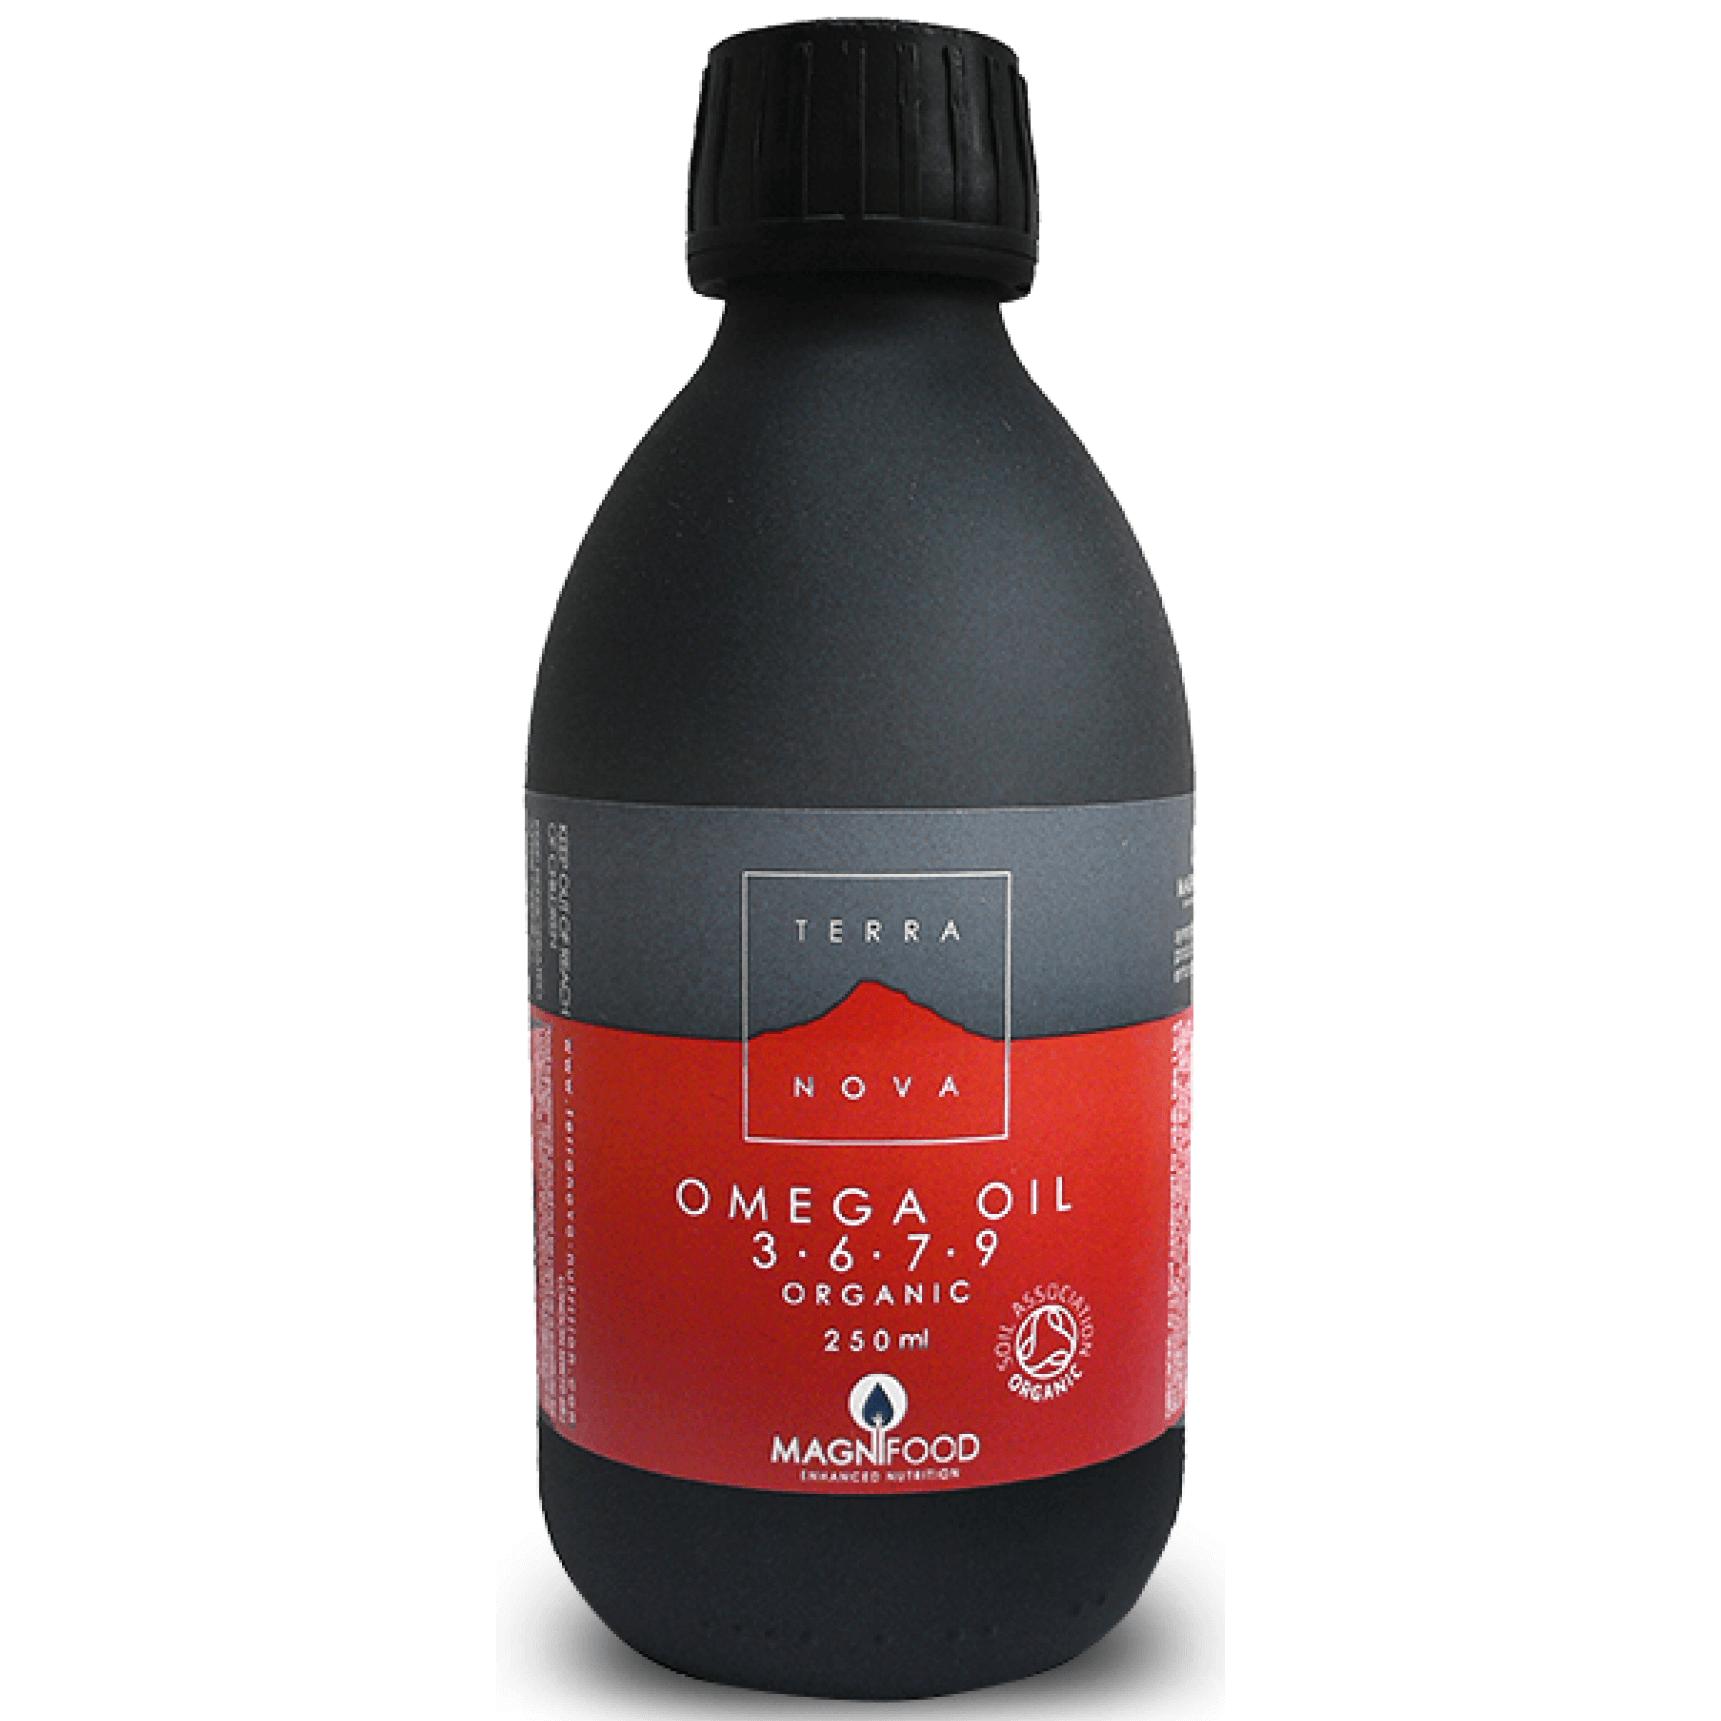 Terranova Omega Oil 3-6-7-9 Το Μόνο 100% Φυτικό, Βιολογικής Καλλιέργειας με Ω7, Χωρίς Ιχθυέλαια 250ml